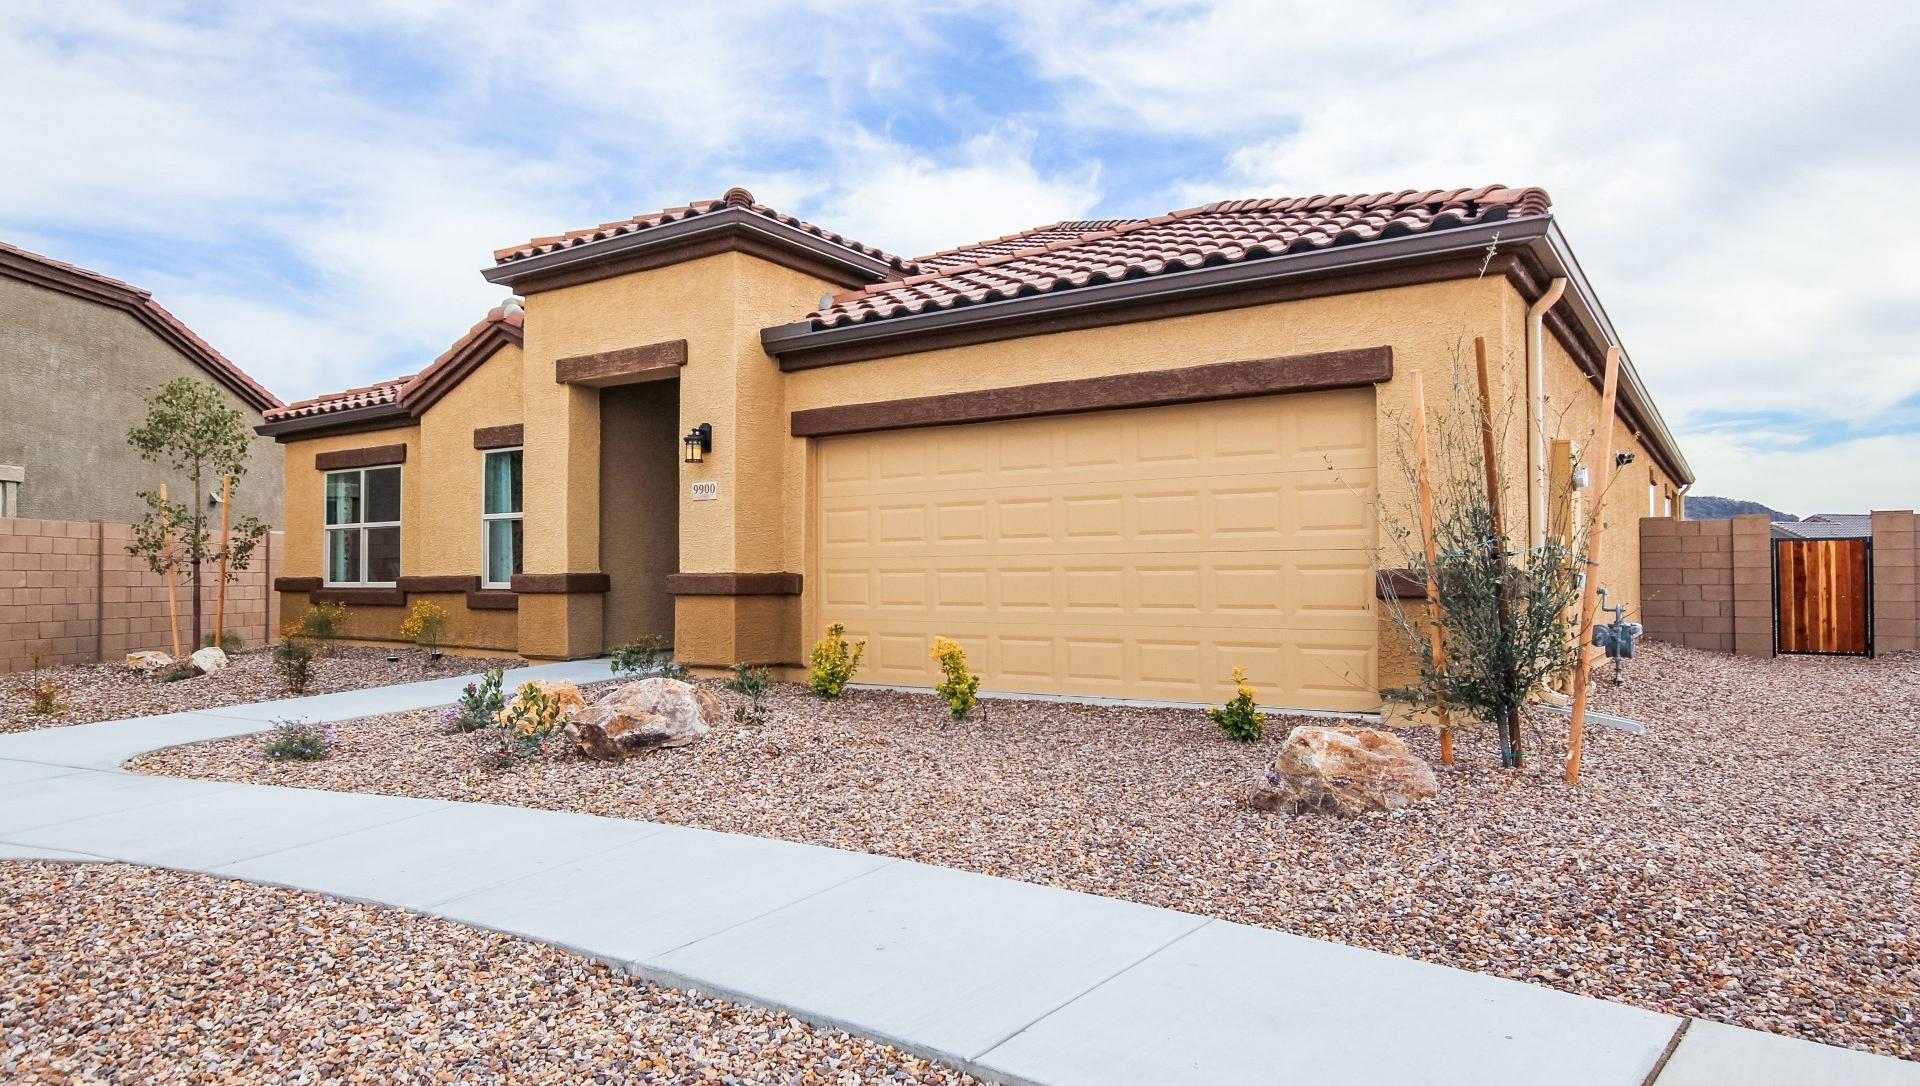 D.R. Horton Santa Cruz Meadows Citrine - Plan 5042 Single Family Home for Sale